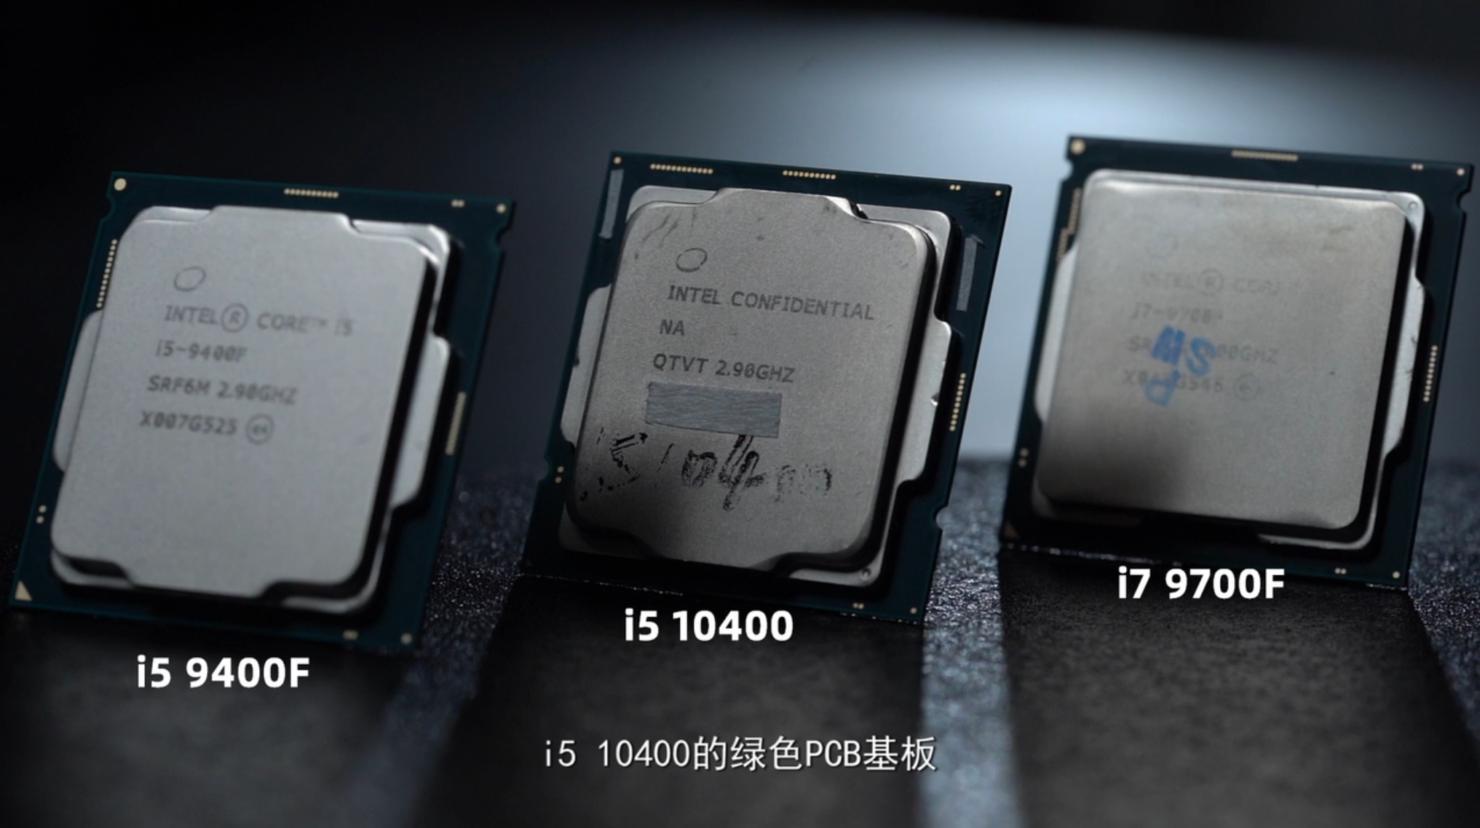 intel-core-i5-10400-comet-lake-s-6-core-desktop-cpu_6